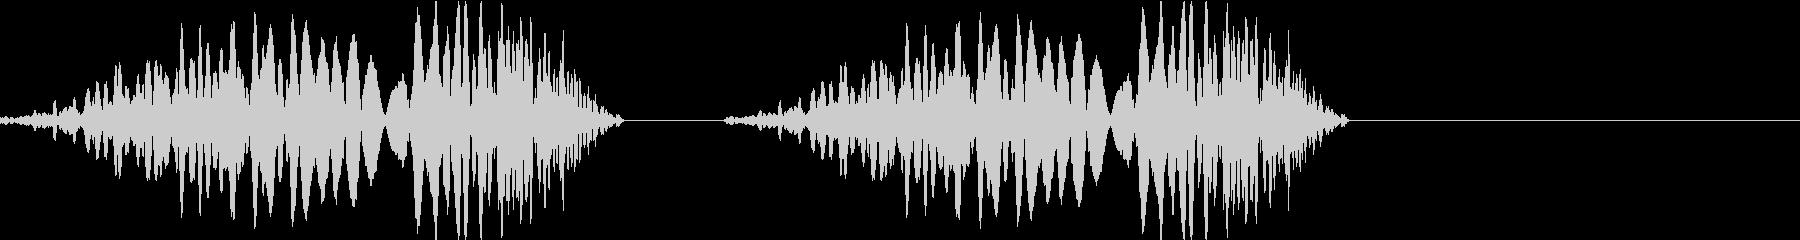 DJプレイ スクラッチ・ノイズ 181の未再生の波形